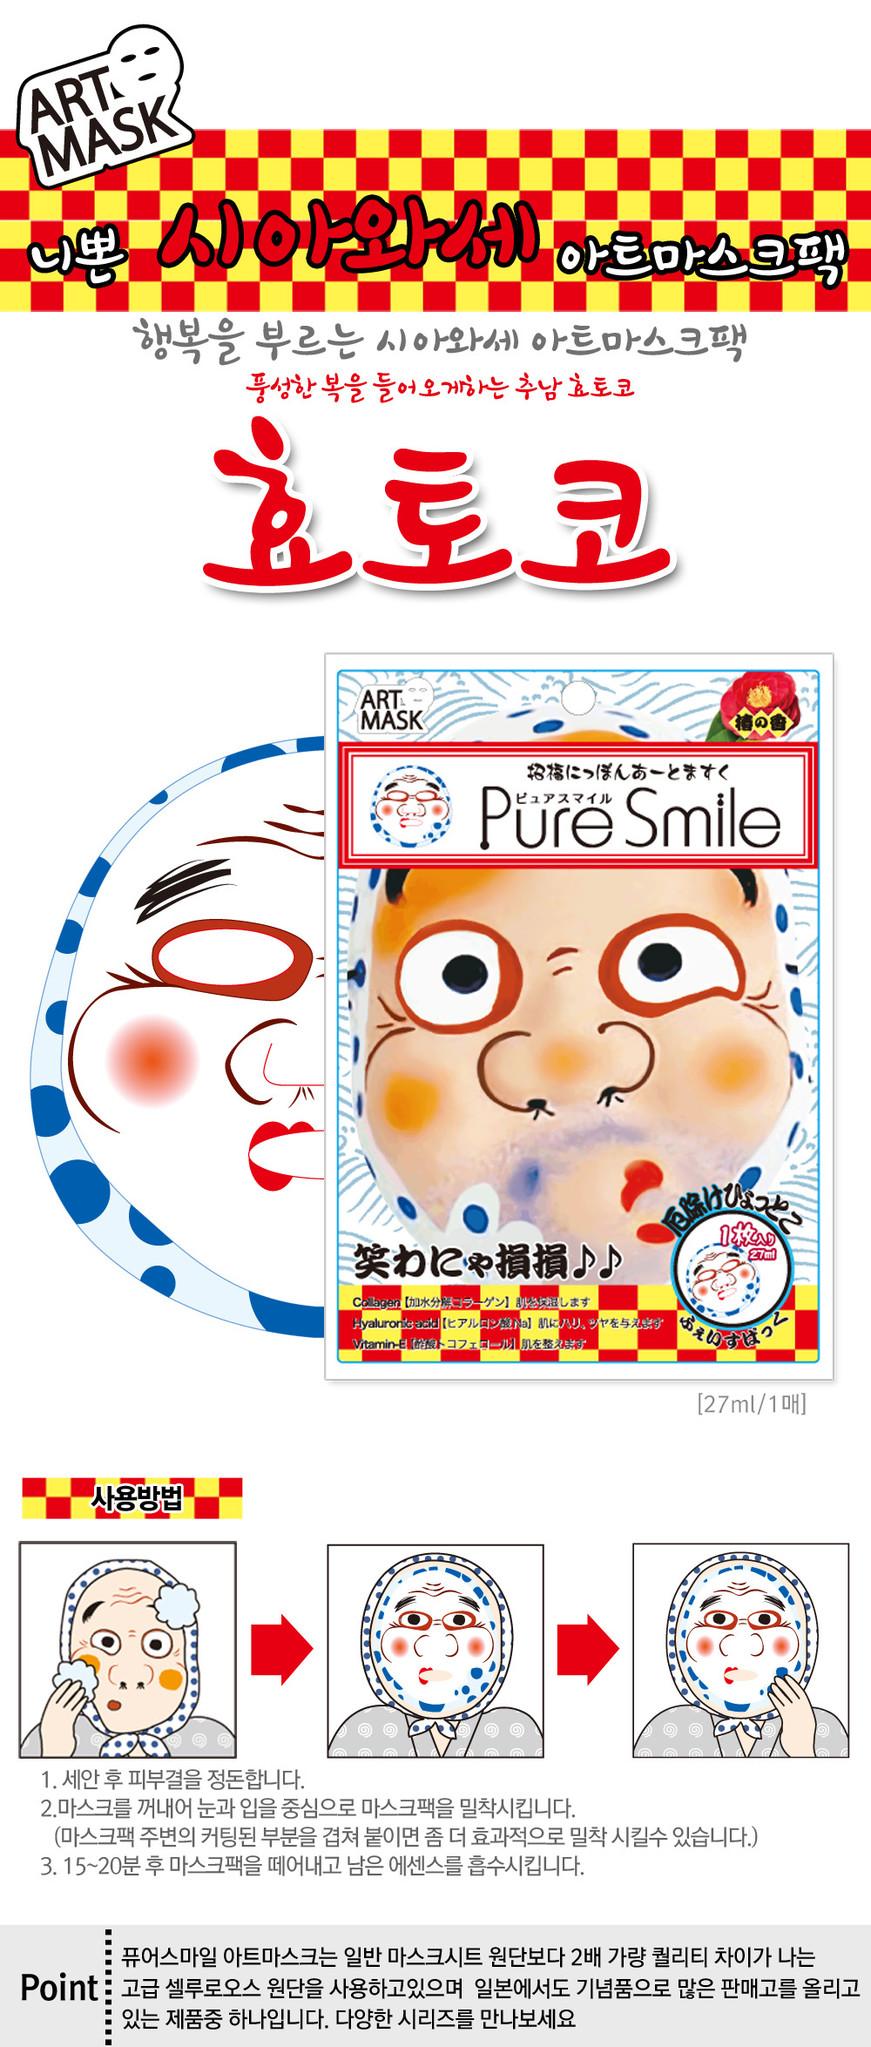 Pure Smile Nippon Art Mask Set ( 3+1 Stk)-5